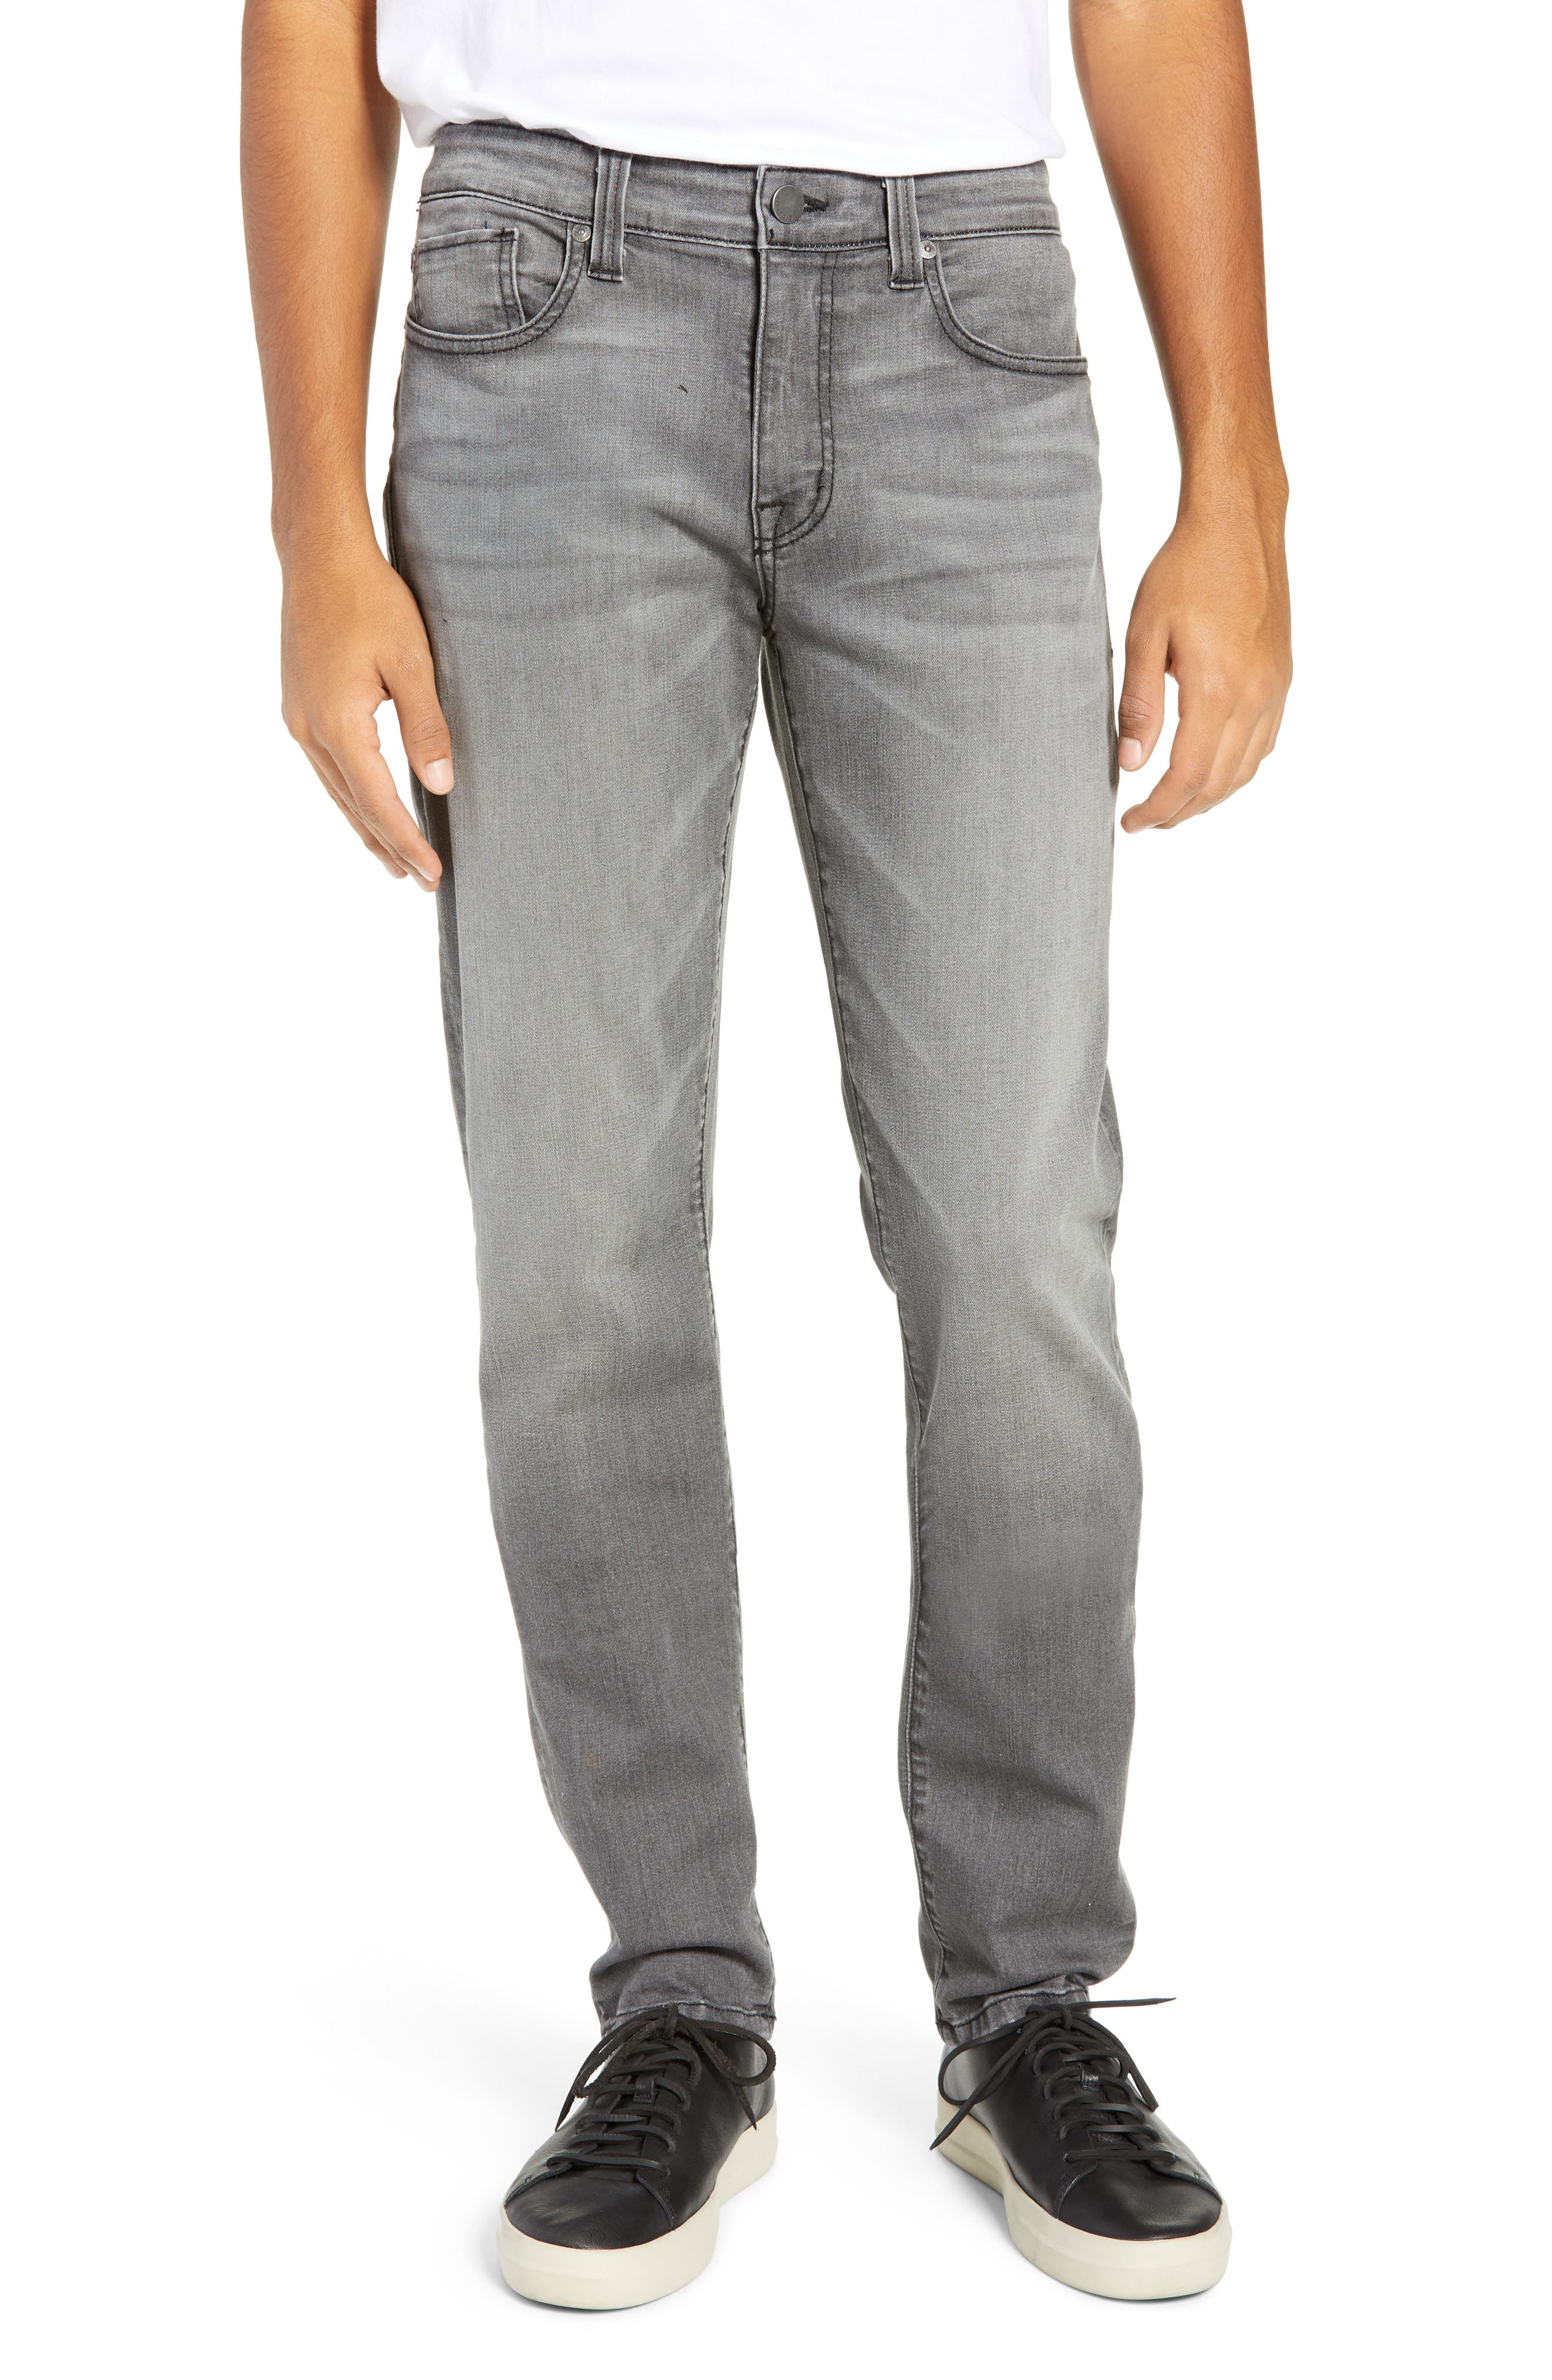 Torino Slim Fit Jeans,                             Main thumbnail 1, color,                             PHANTOM GREY